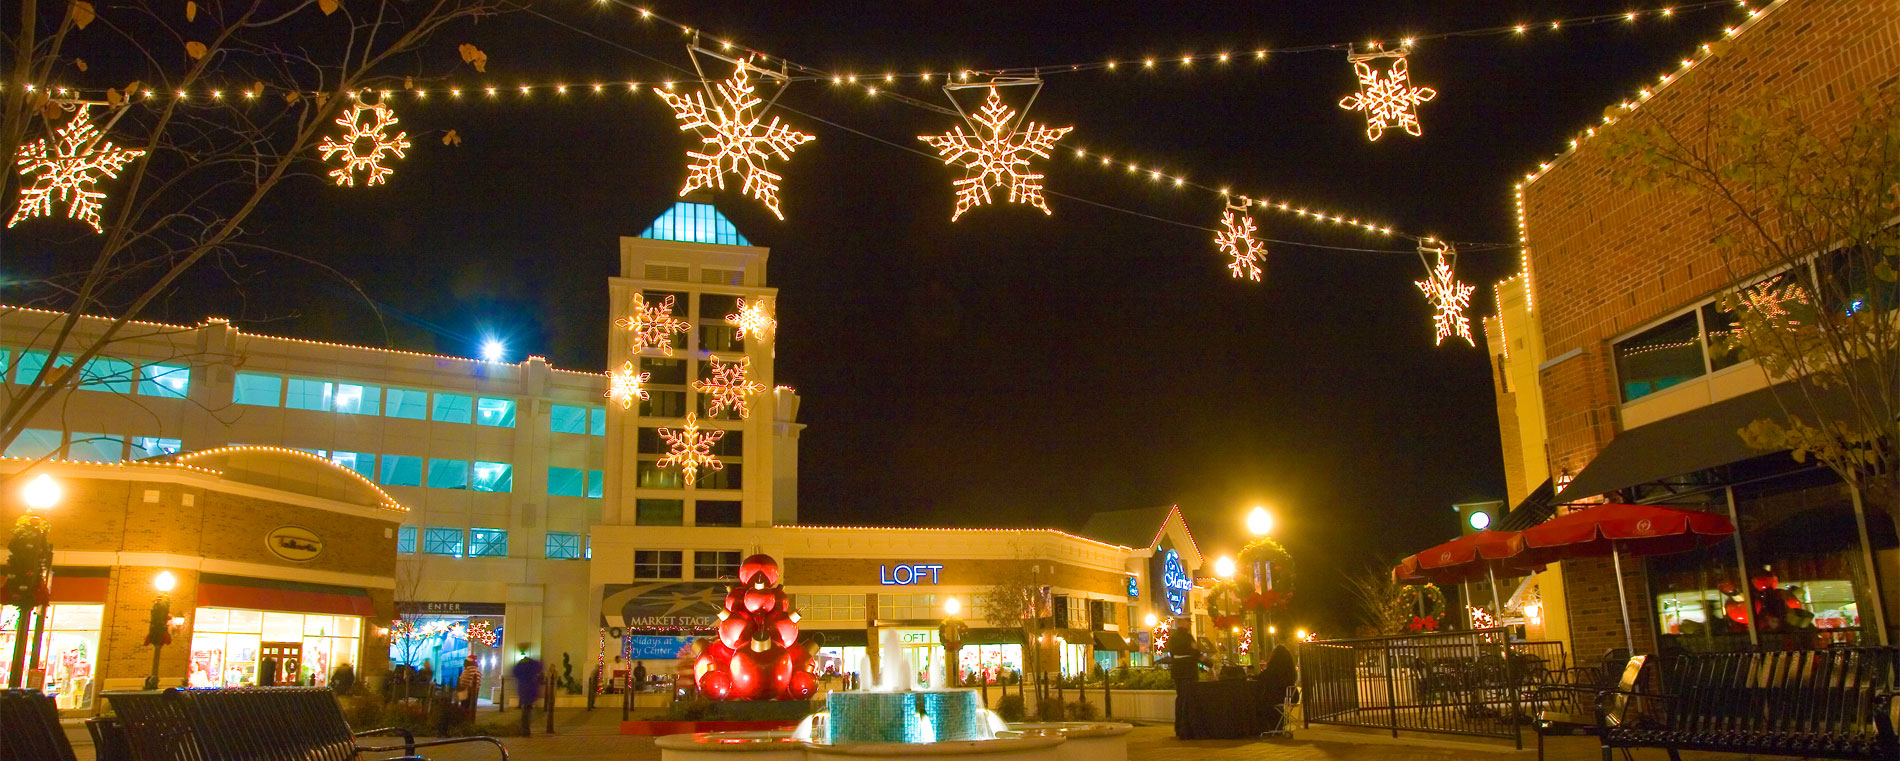 City Center at Oyster Point   Newport News, VA